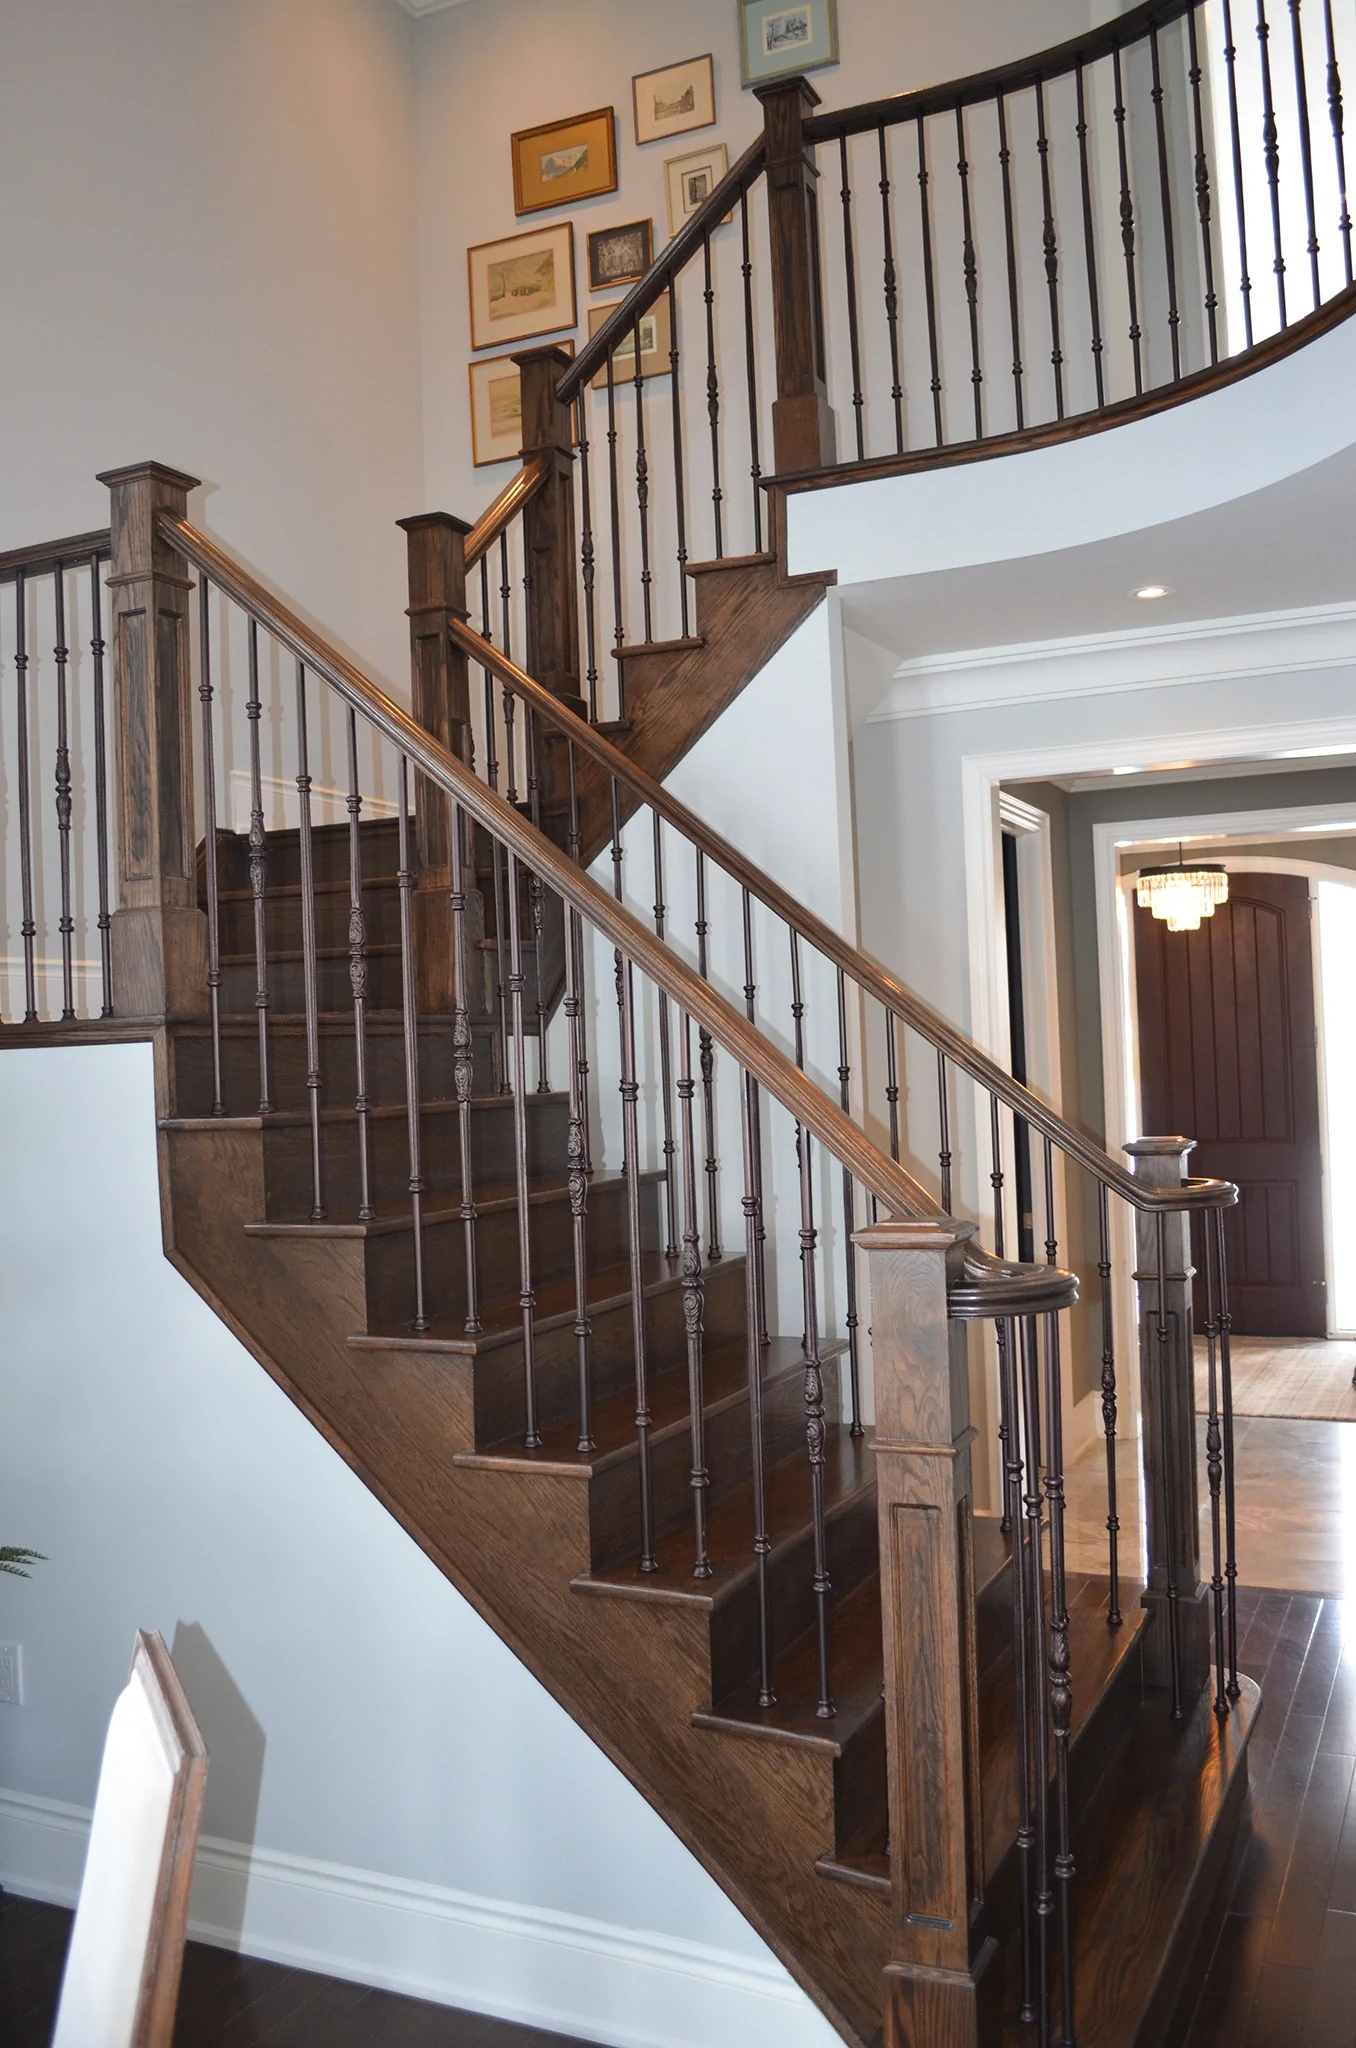 Stairs Railings Ideal Railings Wrought Iron And Dark Wood | Wrought Iron And Wood Stair Railing | C Shaped | Banister | Elegant | Geometric | Design Iron